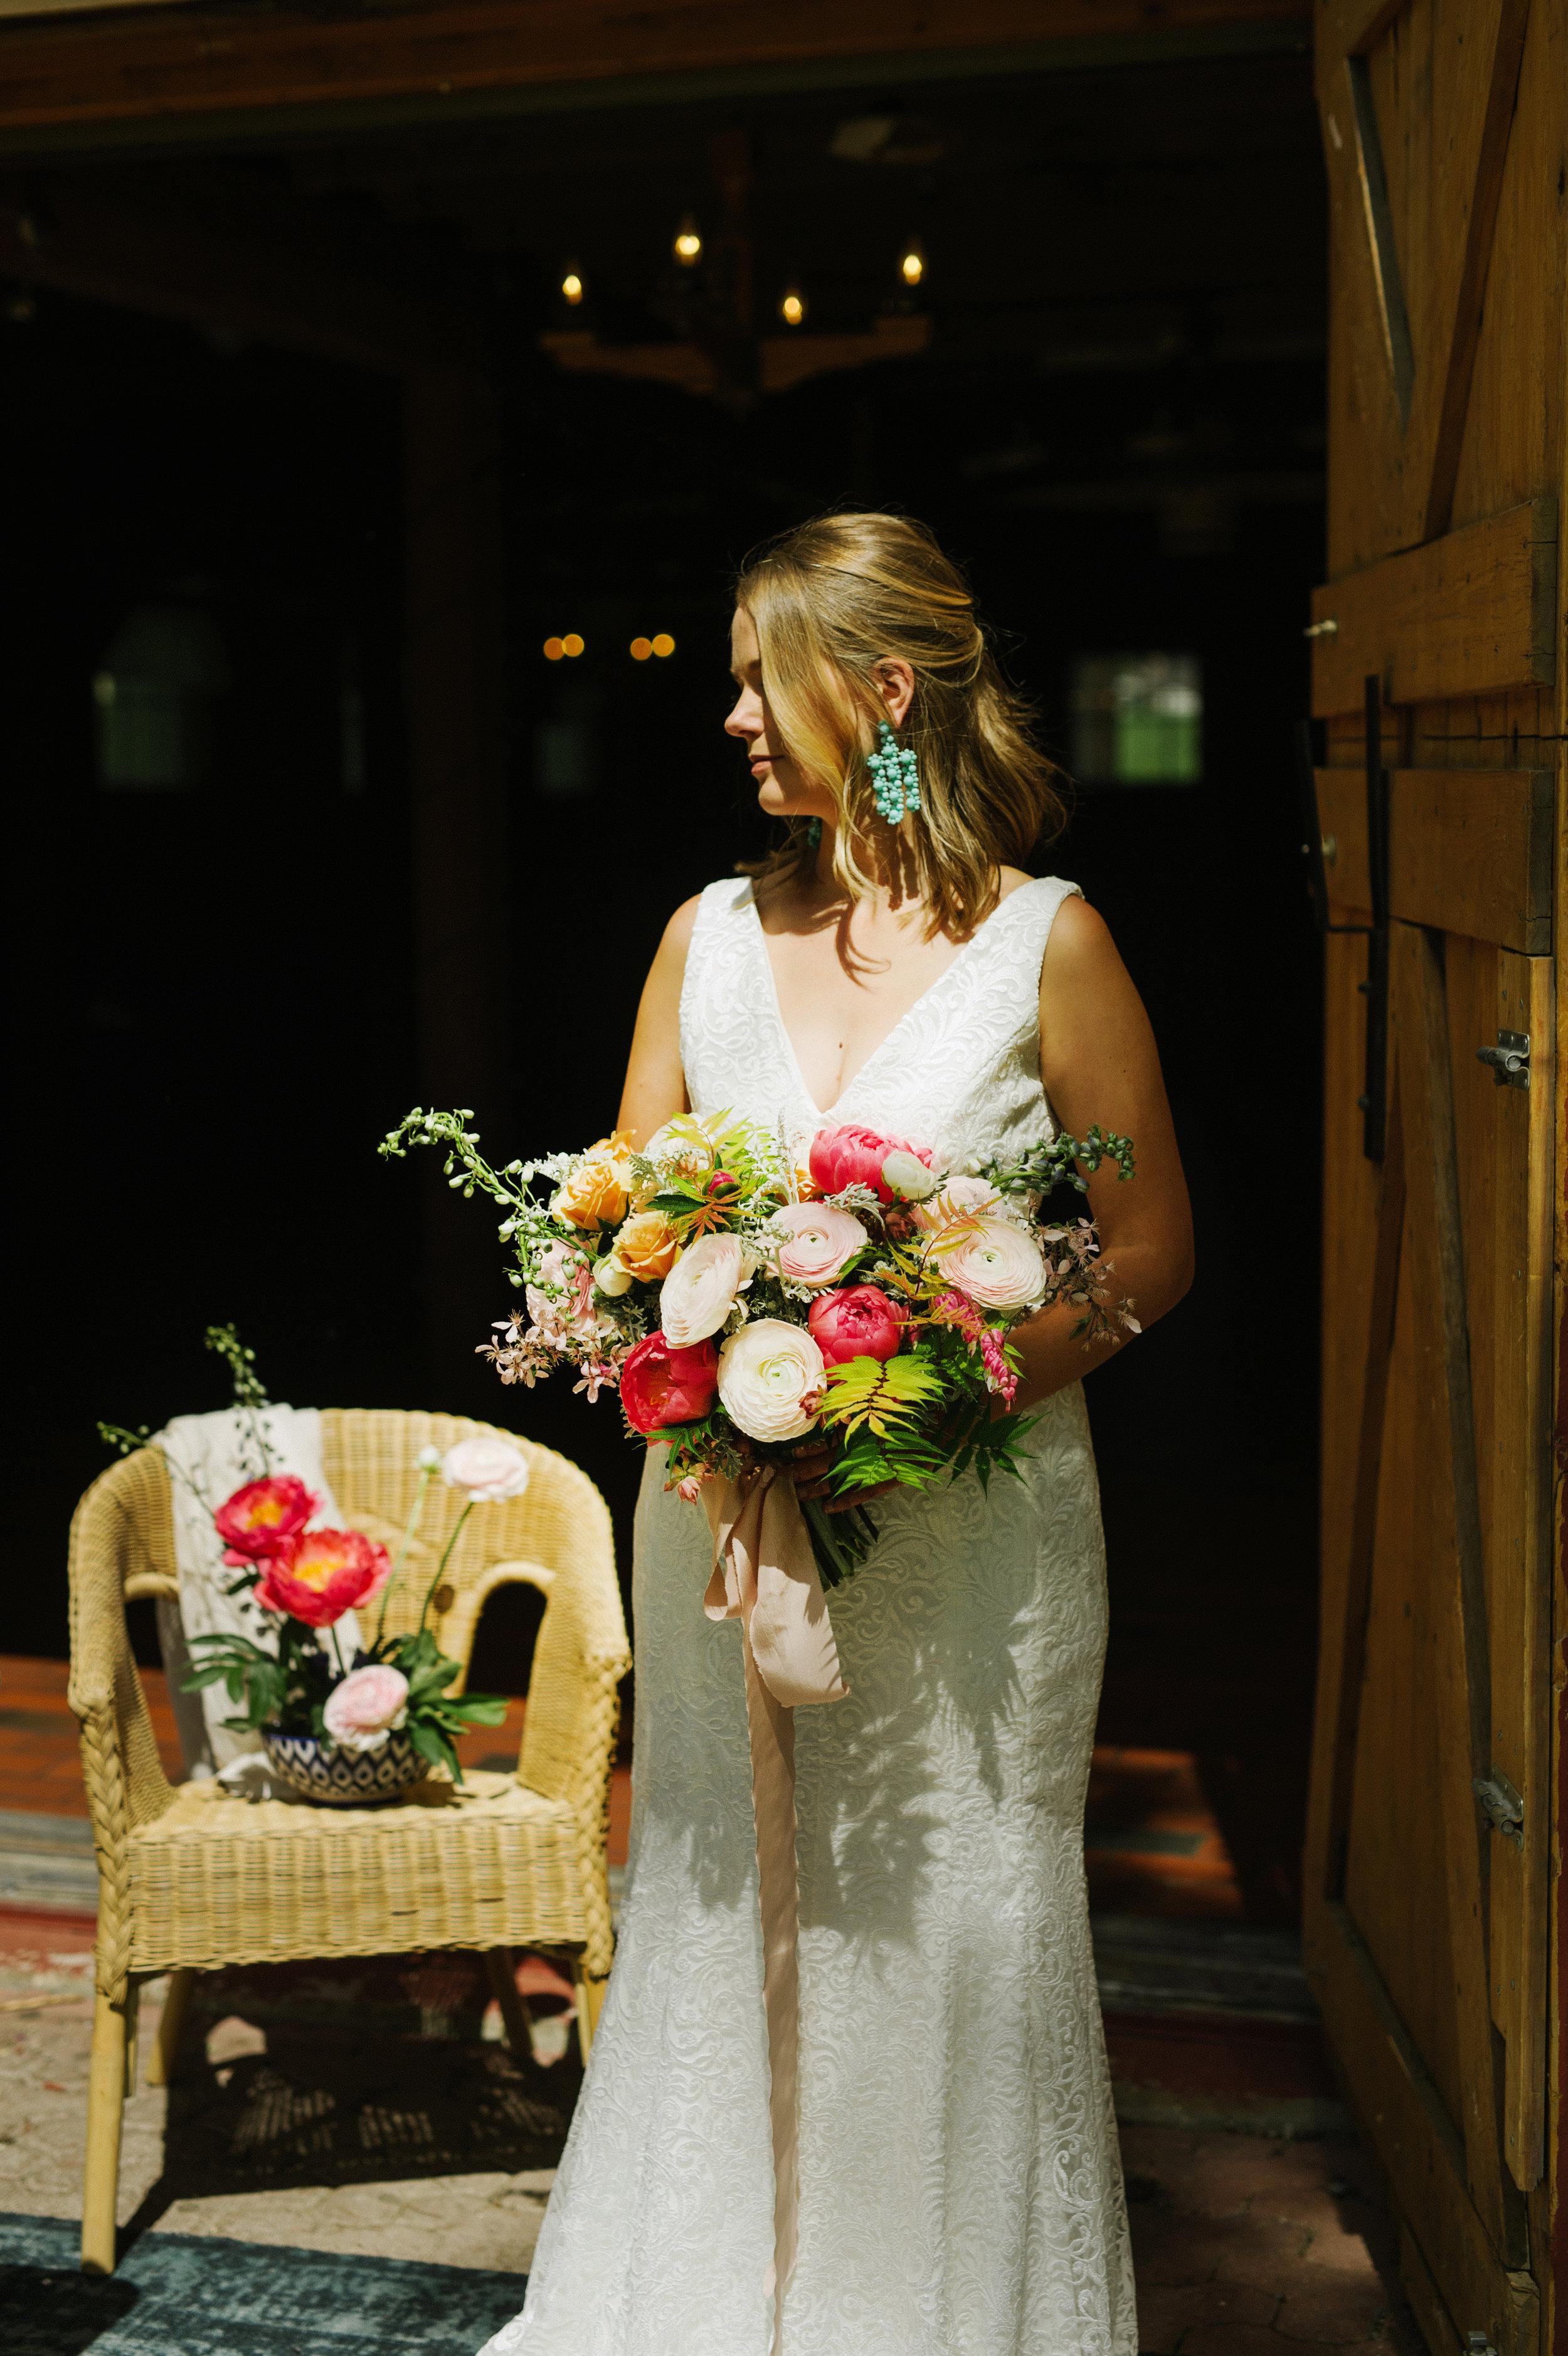 Calgary_Wedding_Photography_Spring_Barn_Wedding_Shoot_2018_HR048.jpg